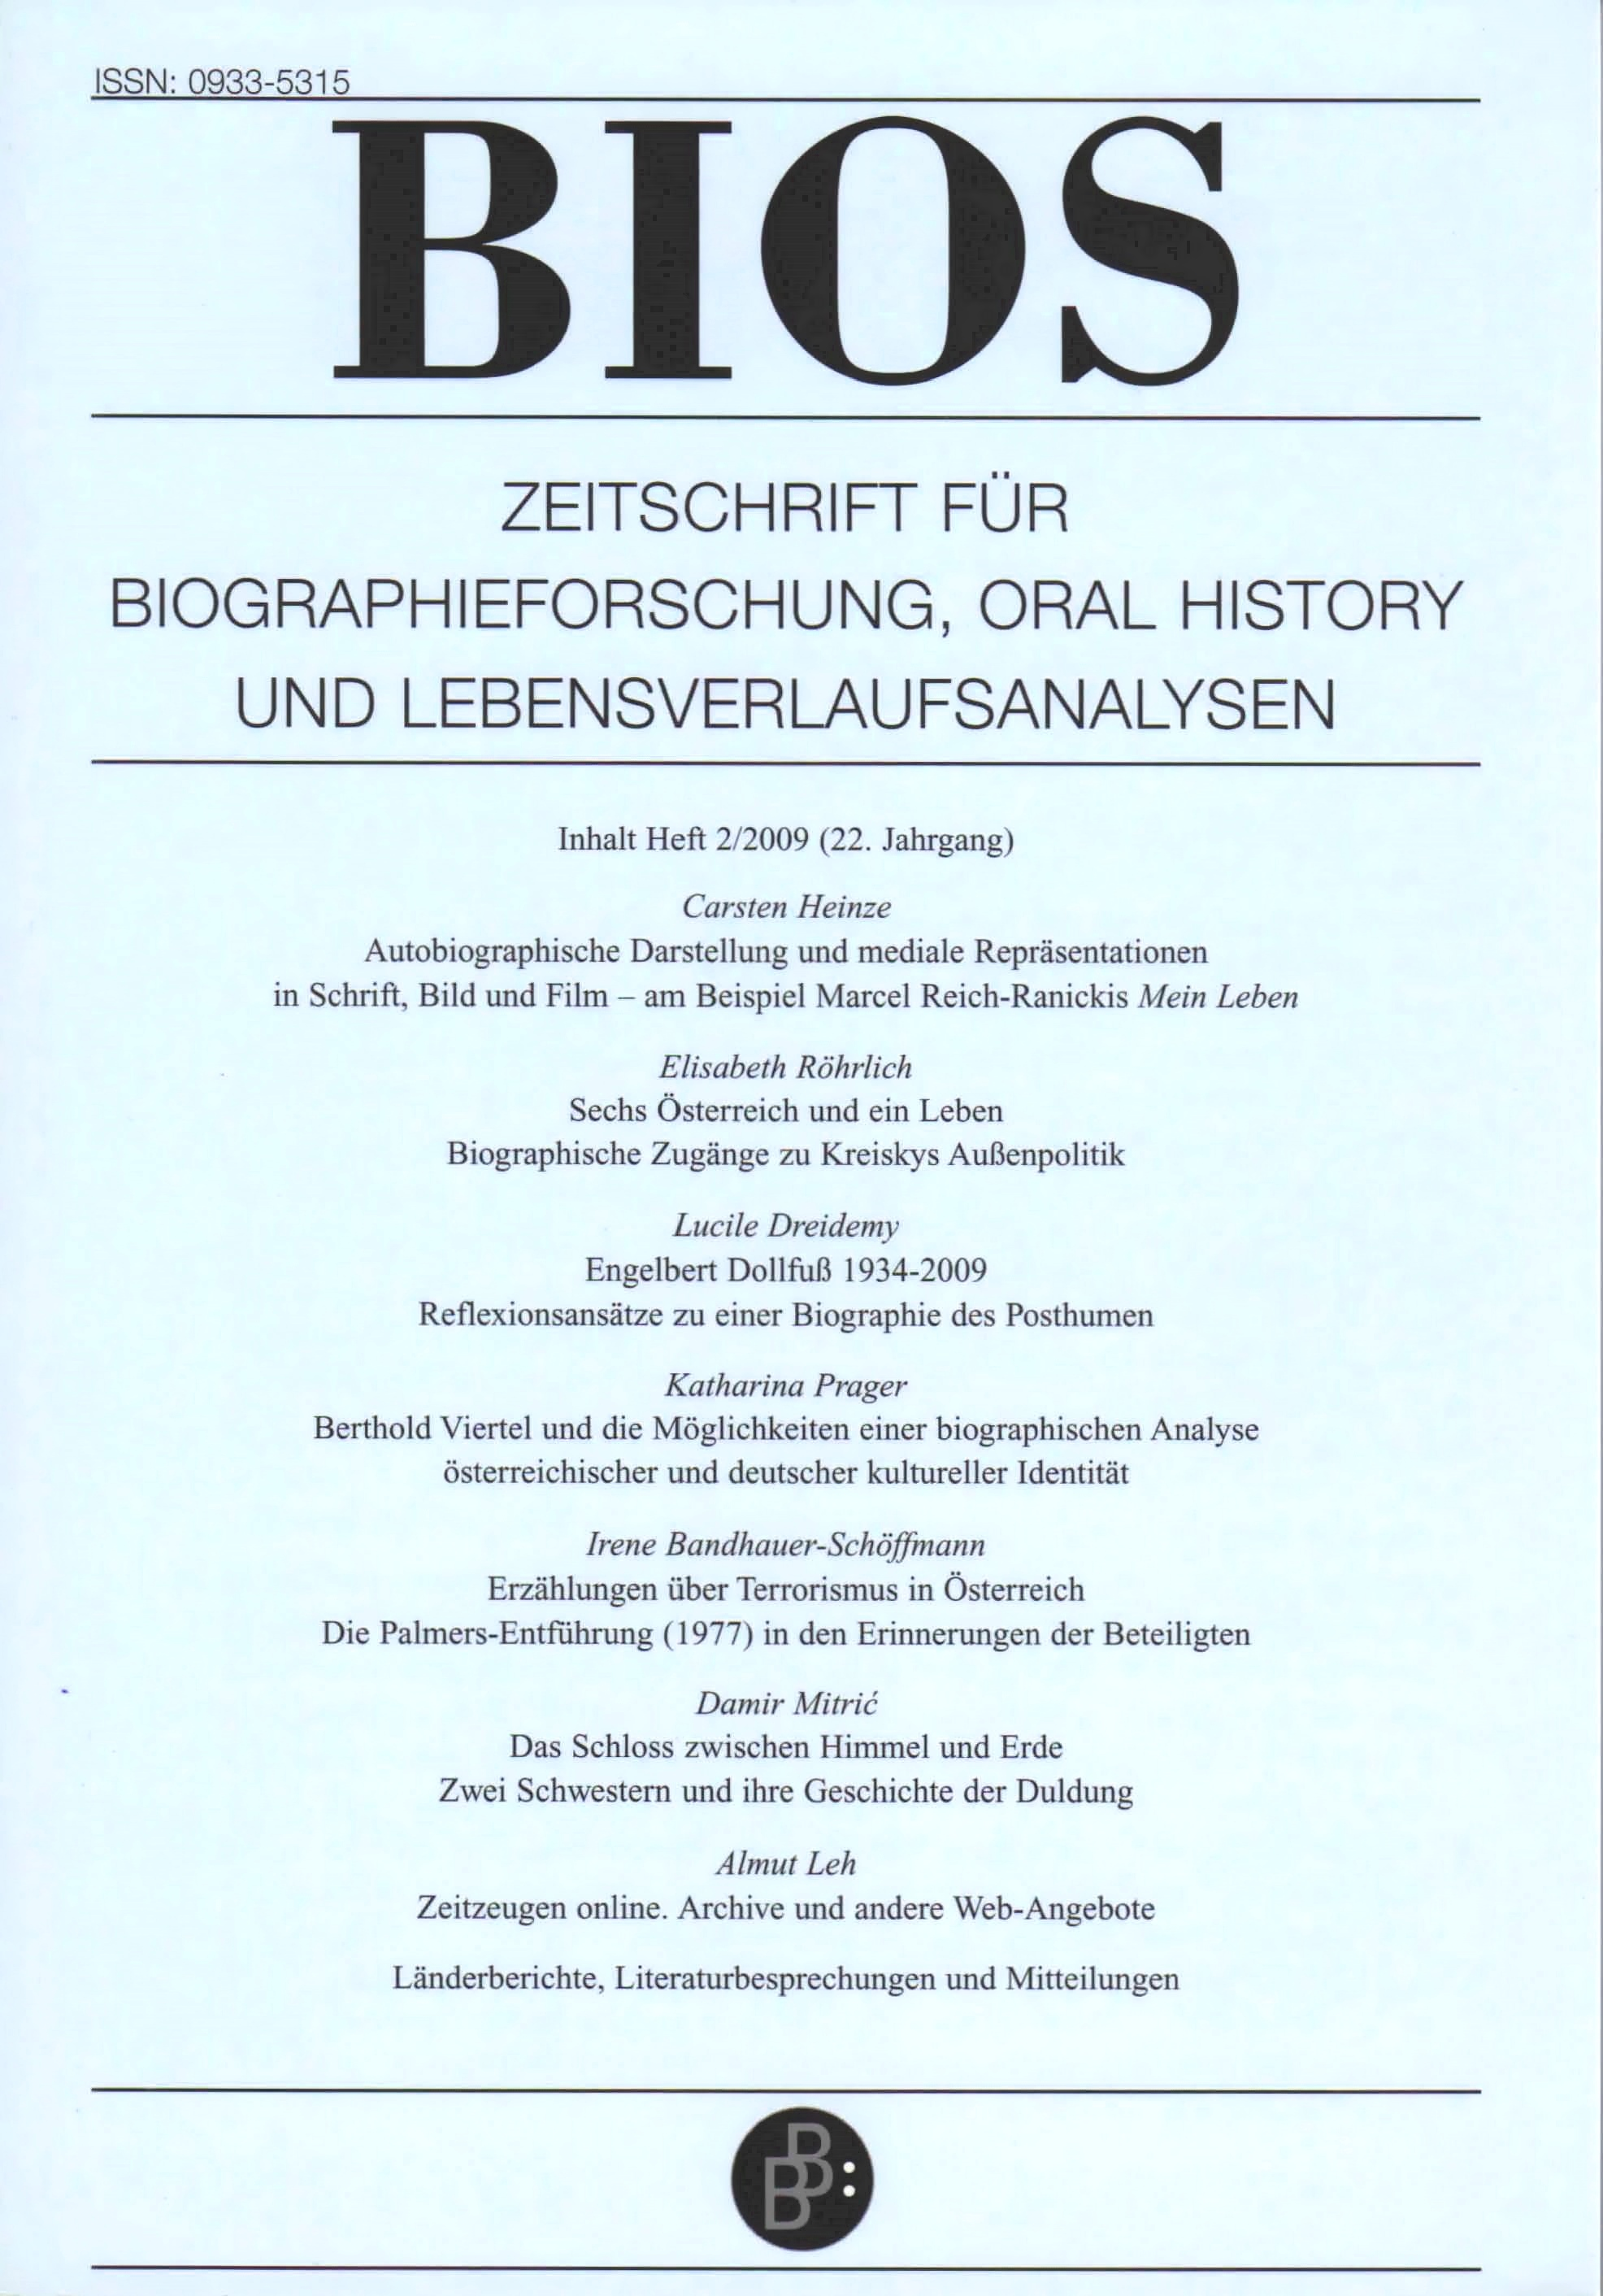 BIOS 2-2009 | Freie Beiträge